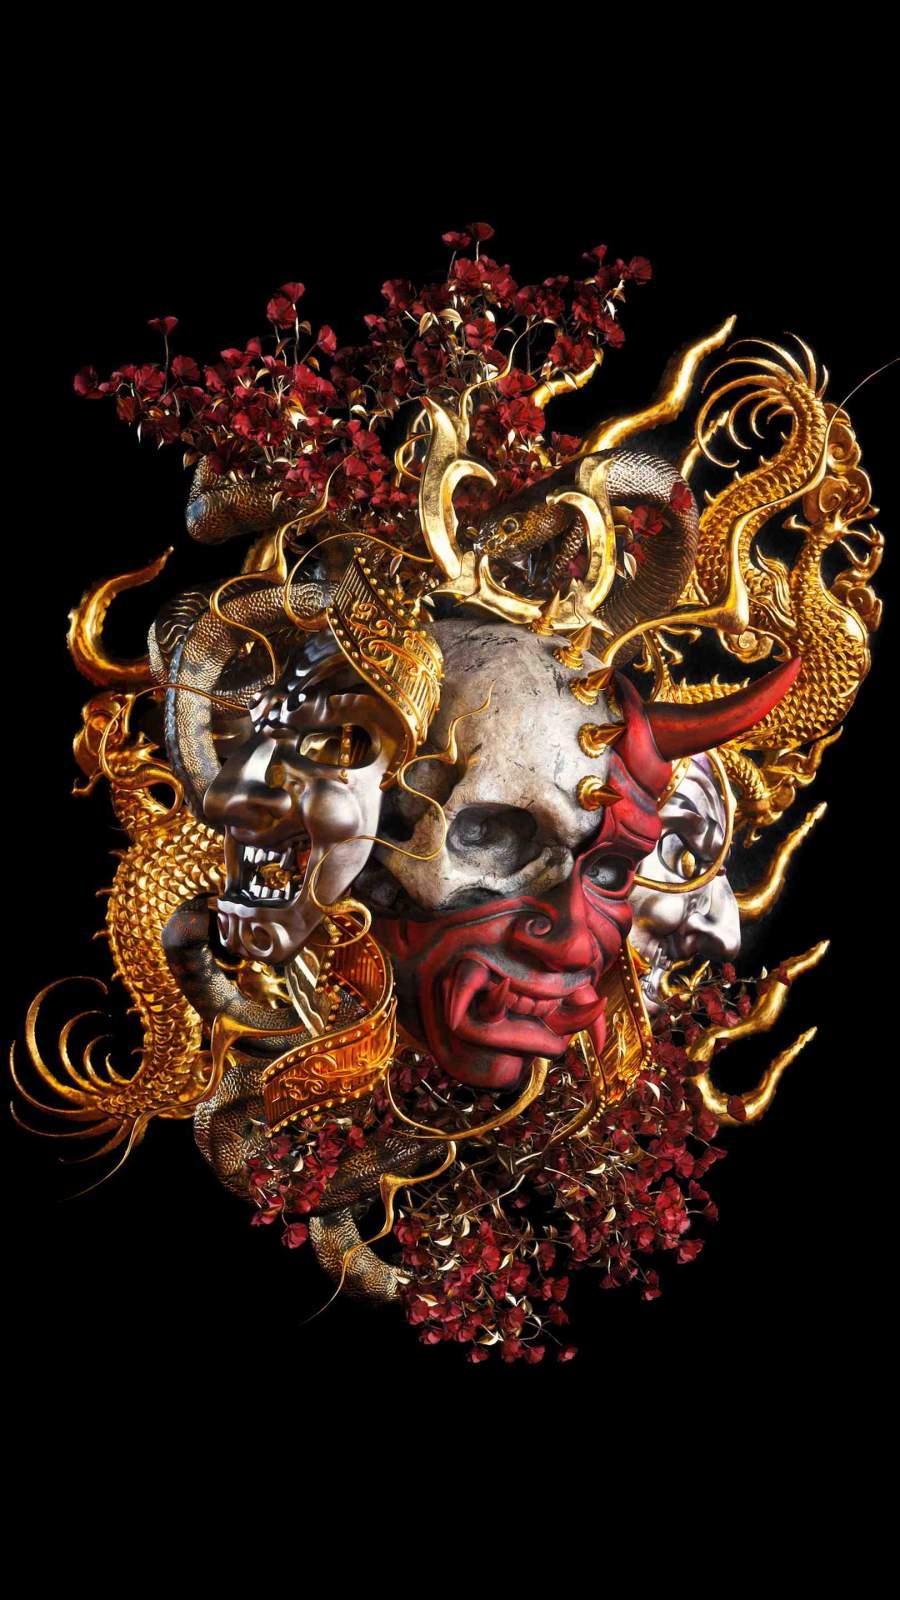 Samurai Skeleton iPhone Wallpaper